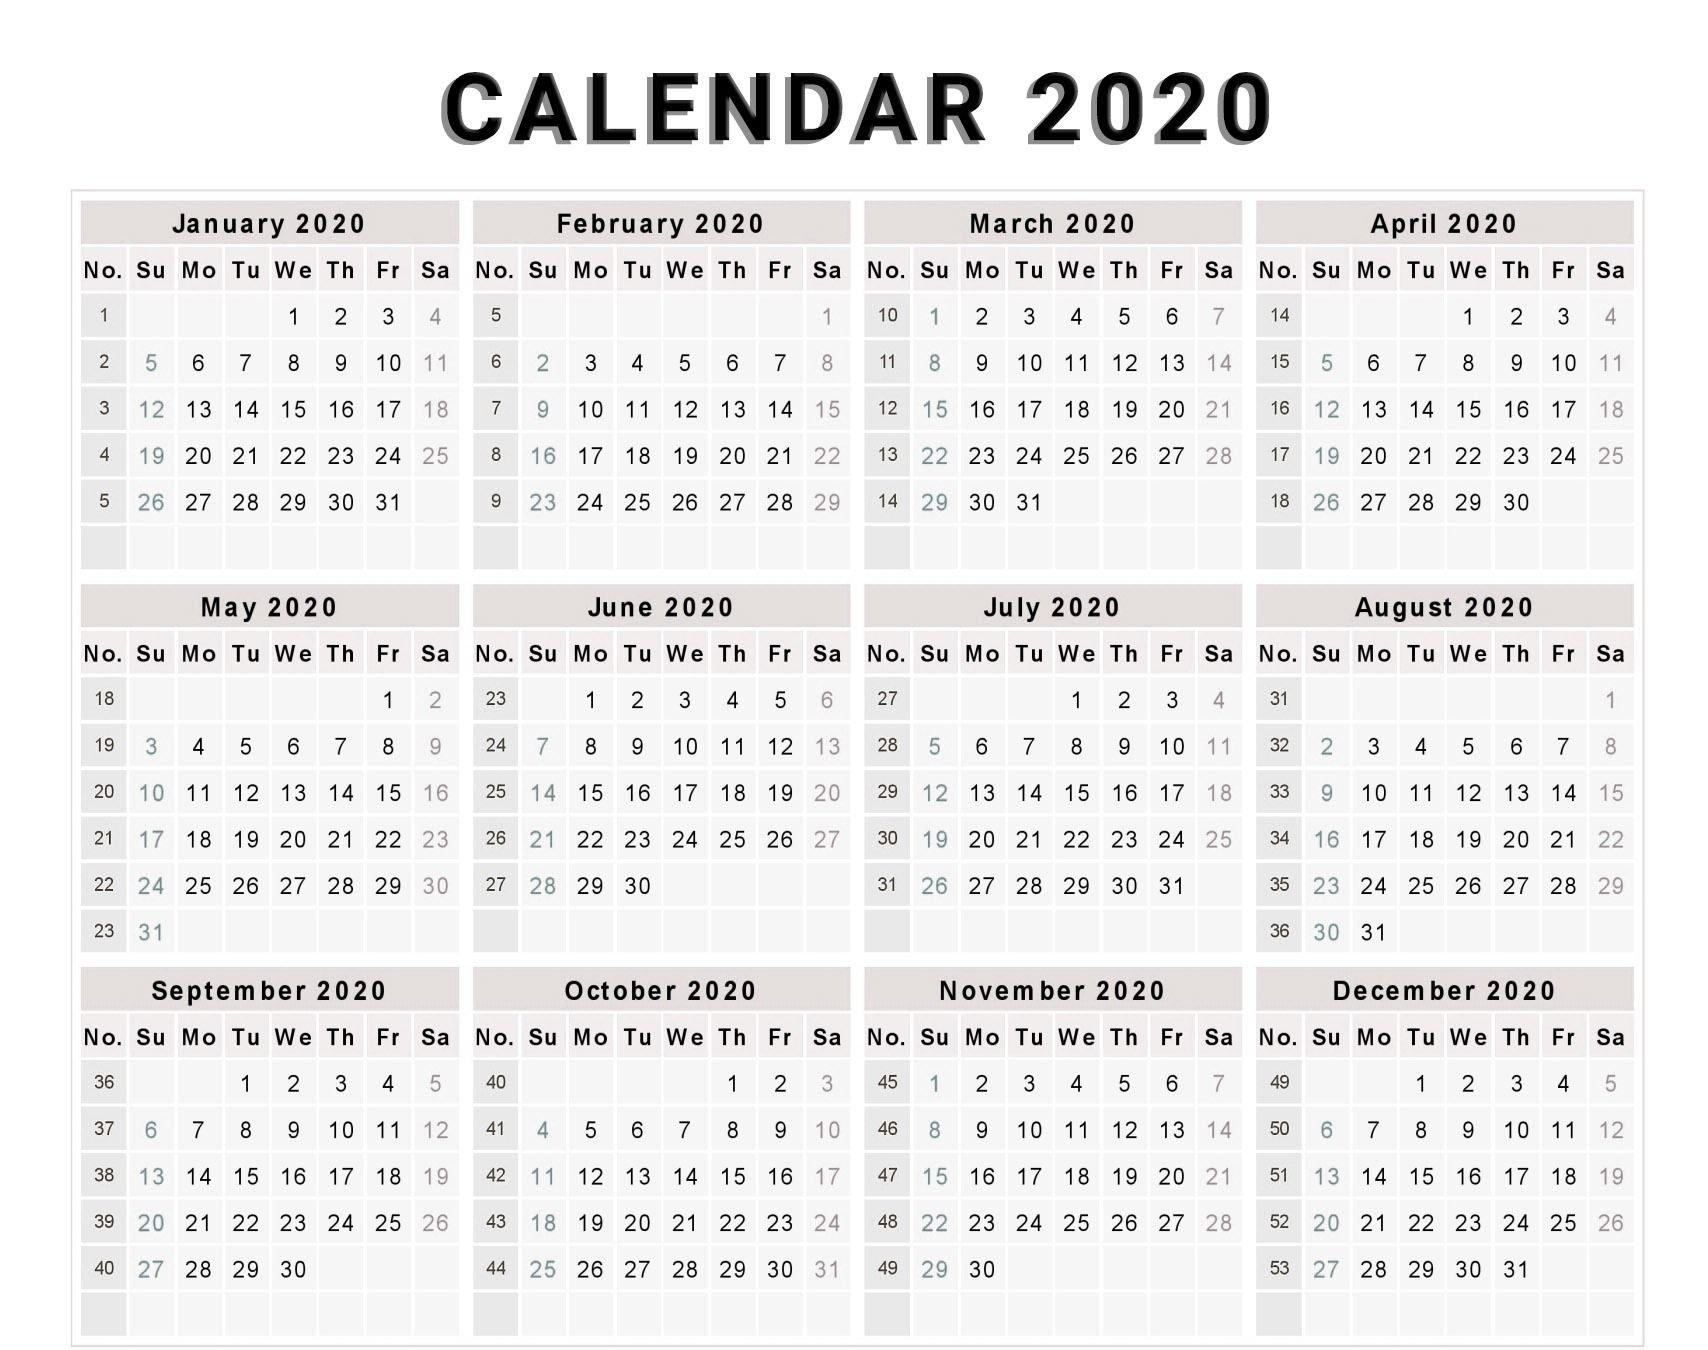 Free Editable 2020 Calendar Printable Template   Calendar Sap 52 Week Numbered Calendar